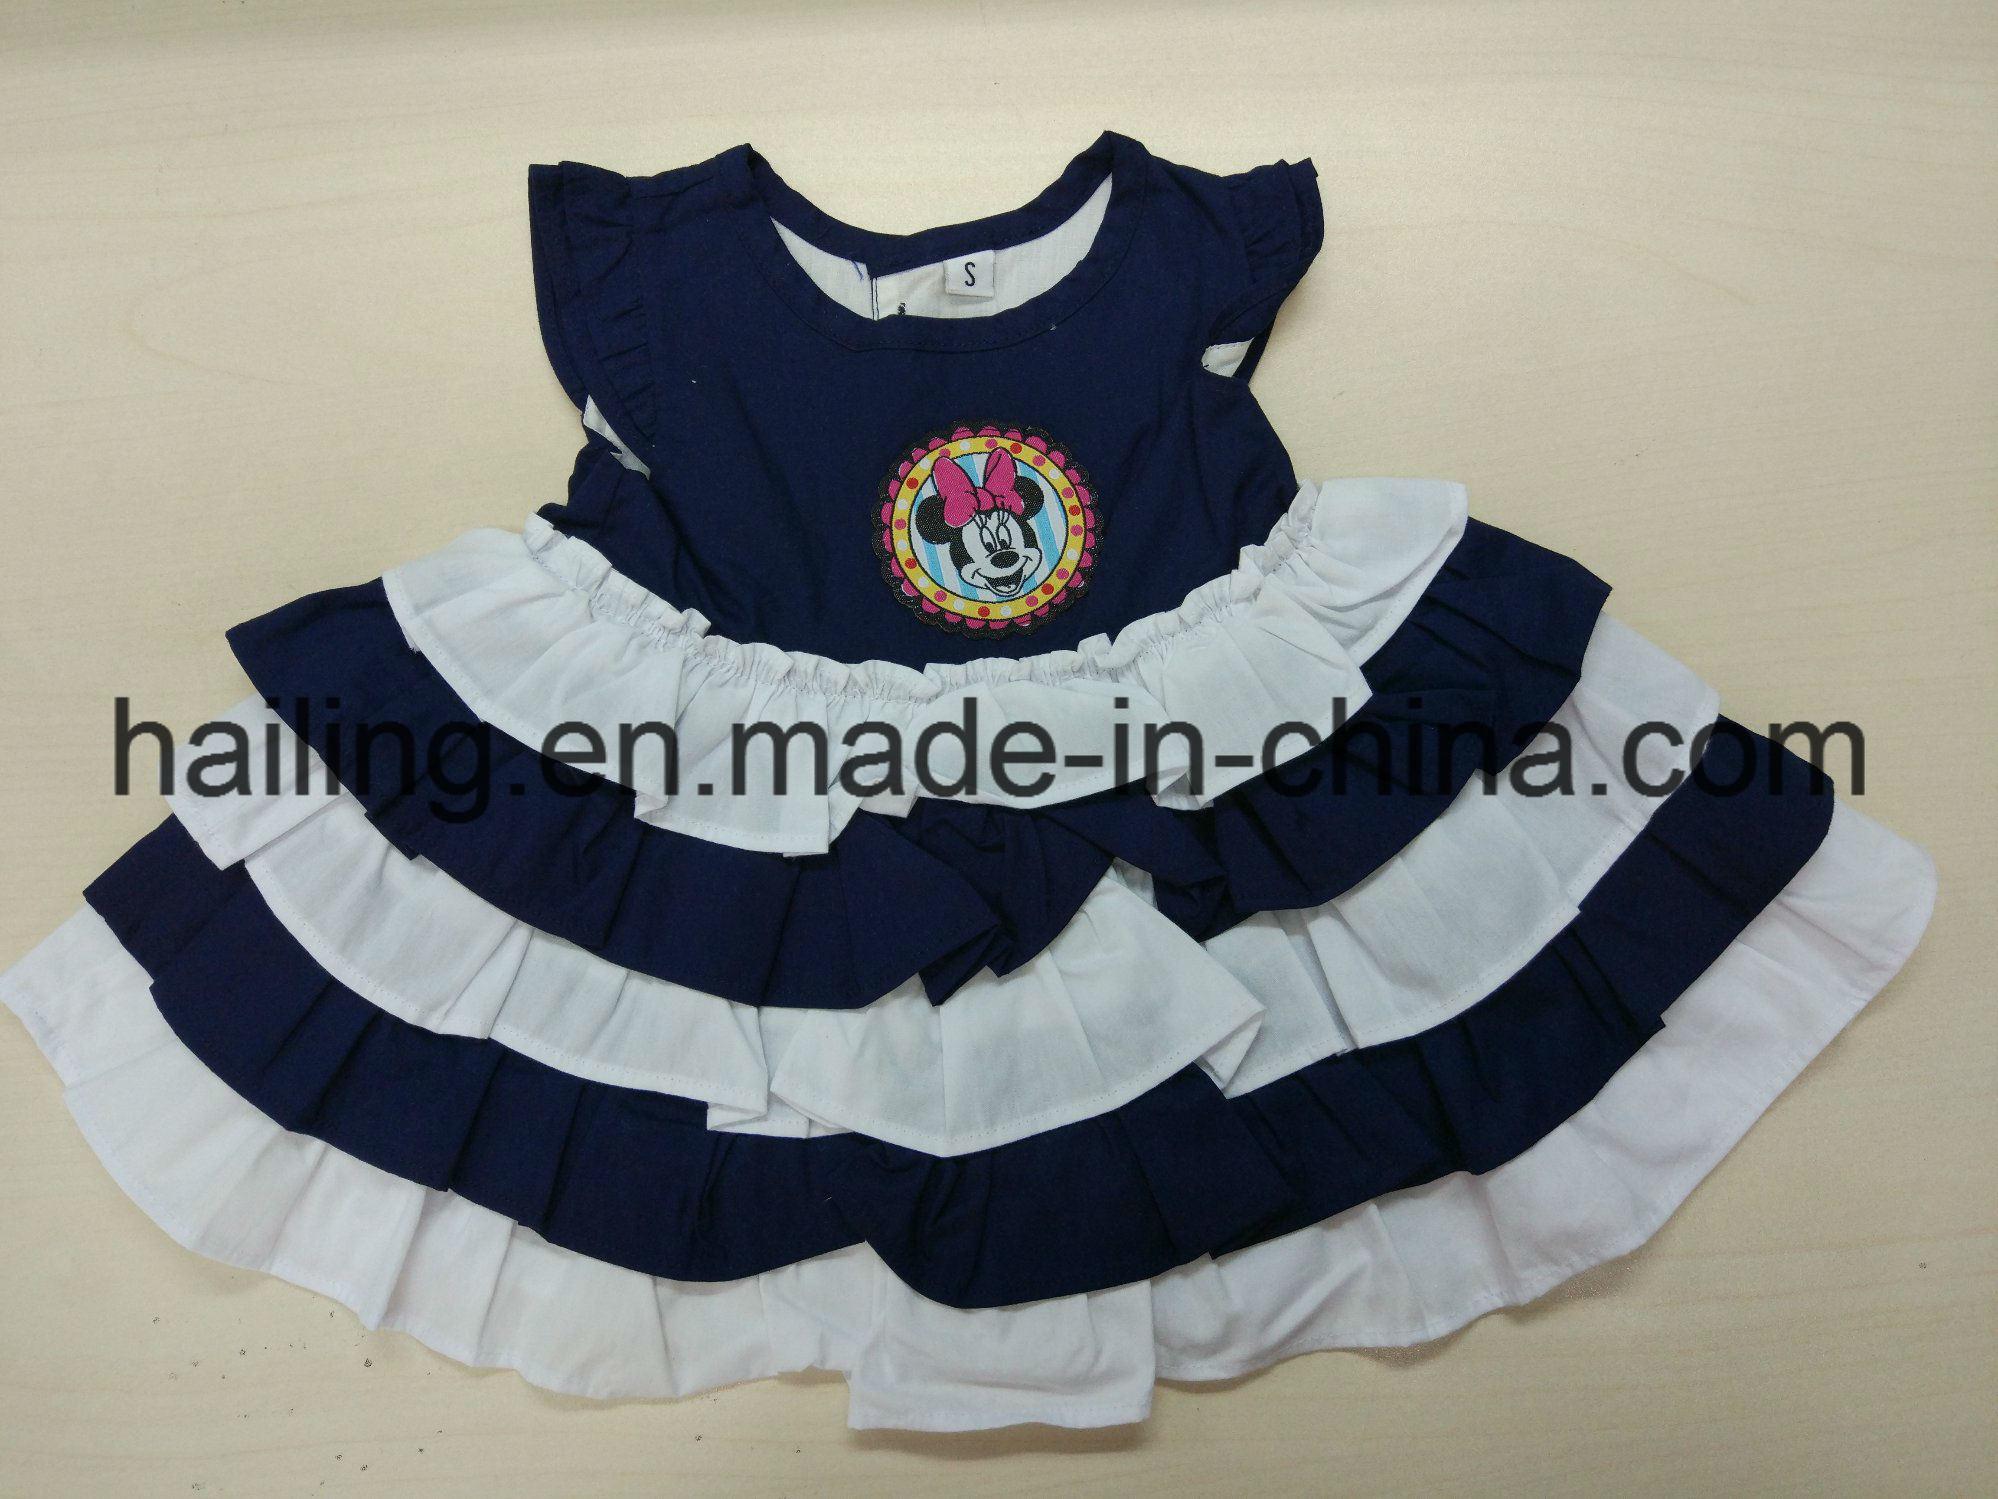 9aa10b73a China Baby Girl 100% Cotton Comfortable Dress - China Baby Dress ...